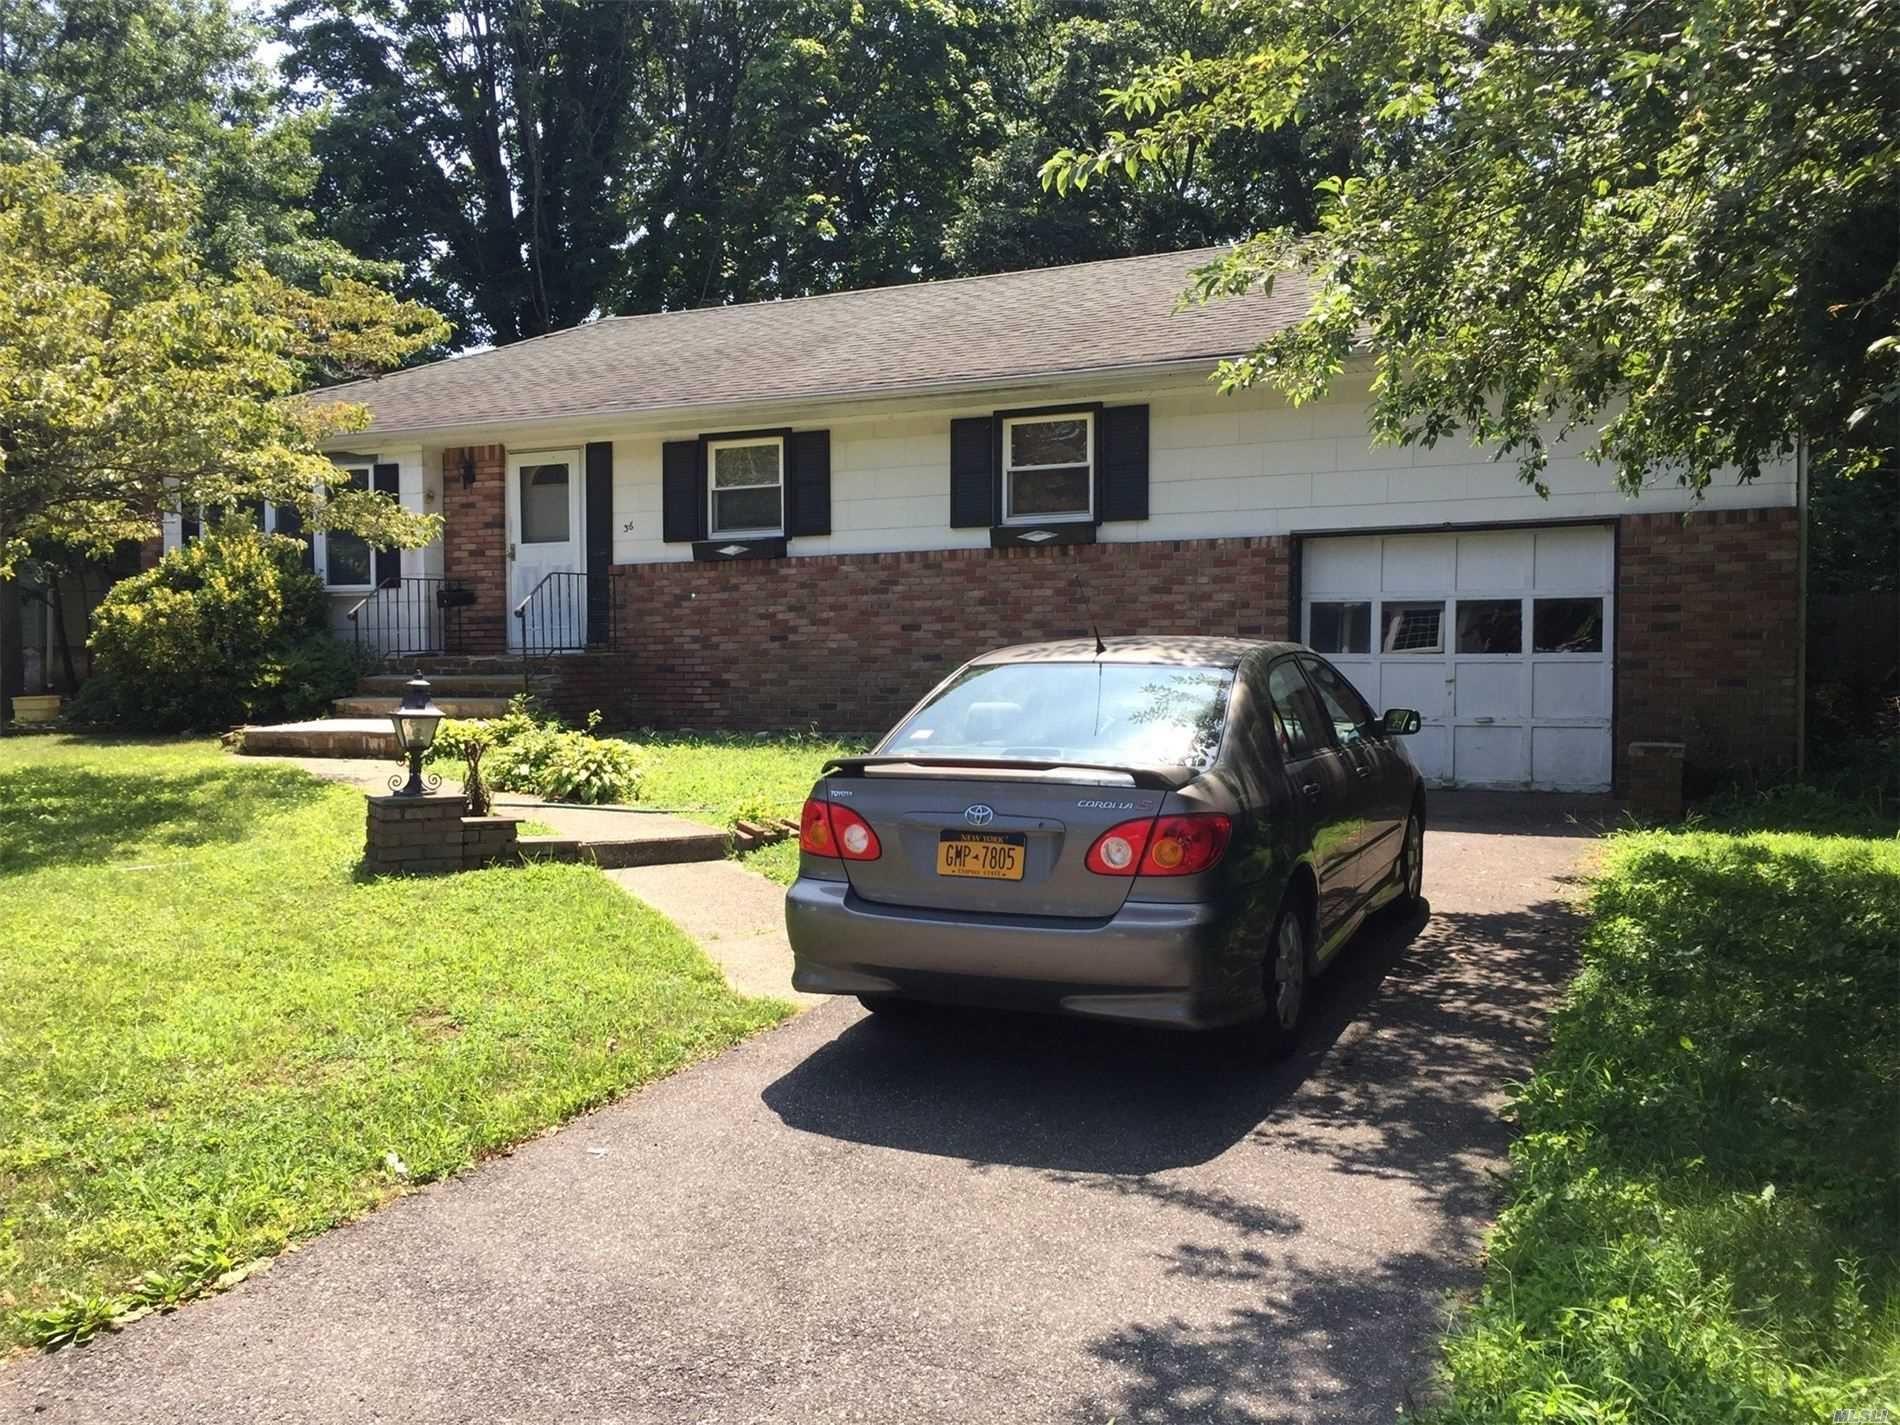 36 Terrace View Road, Farmingdale, NY 11735 - MLS#: 3196352